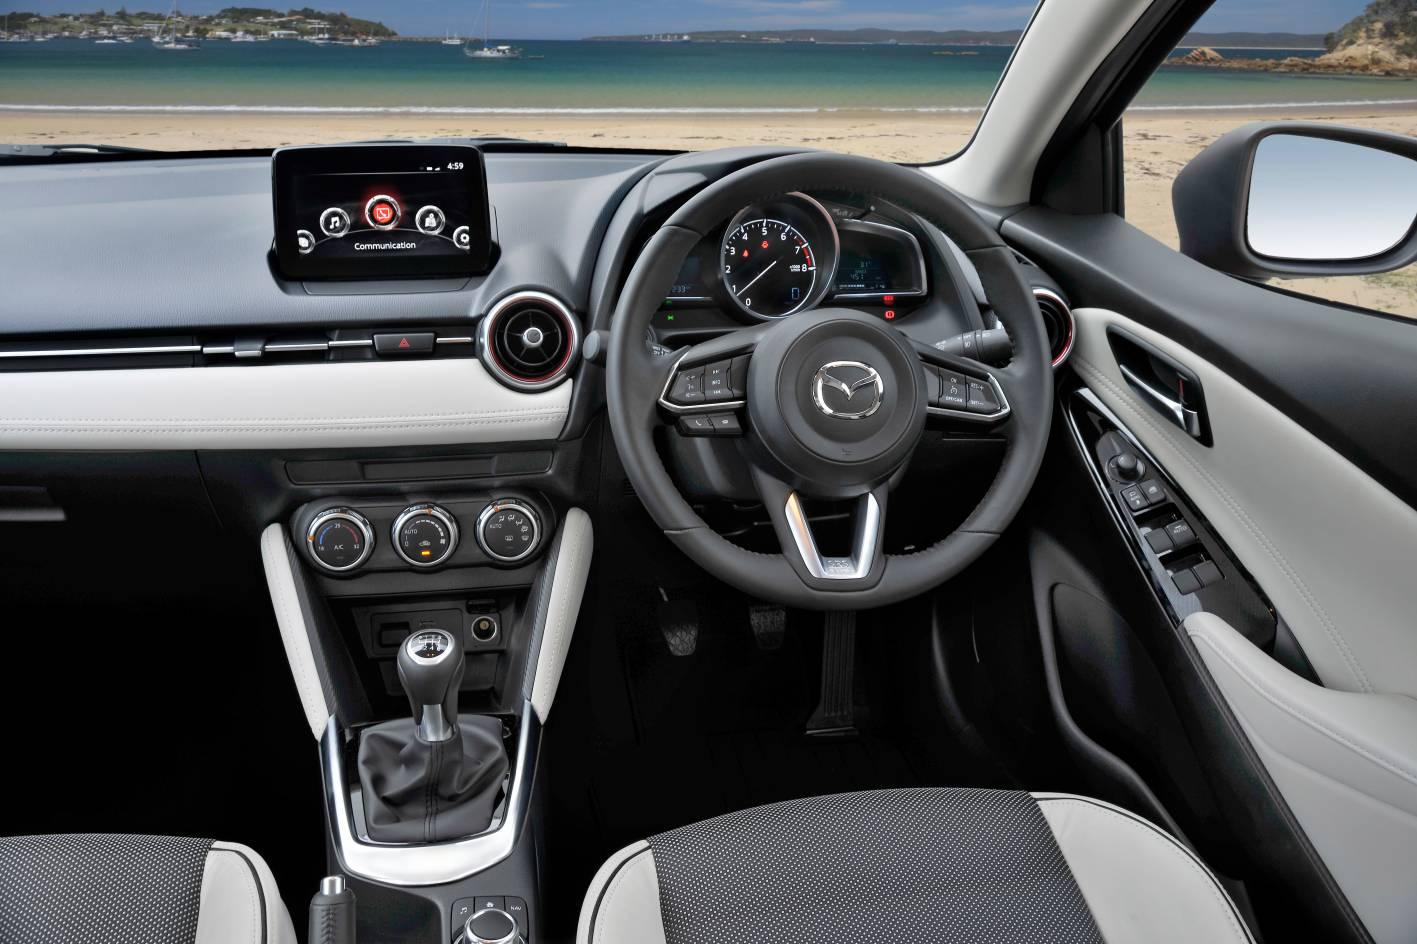 2017 Mazda2 gets segment first safety upgrade - ForceGT.com